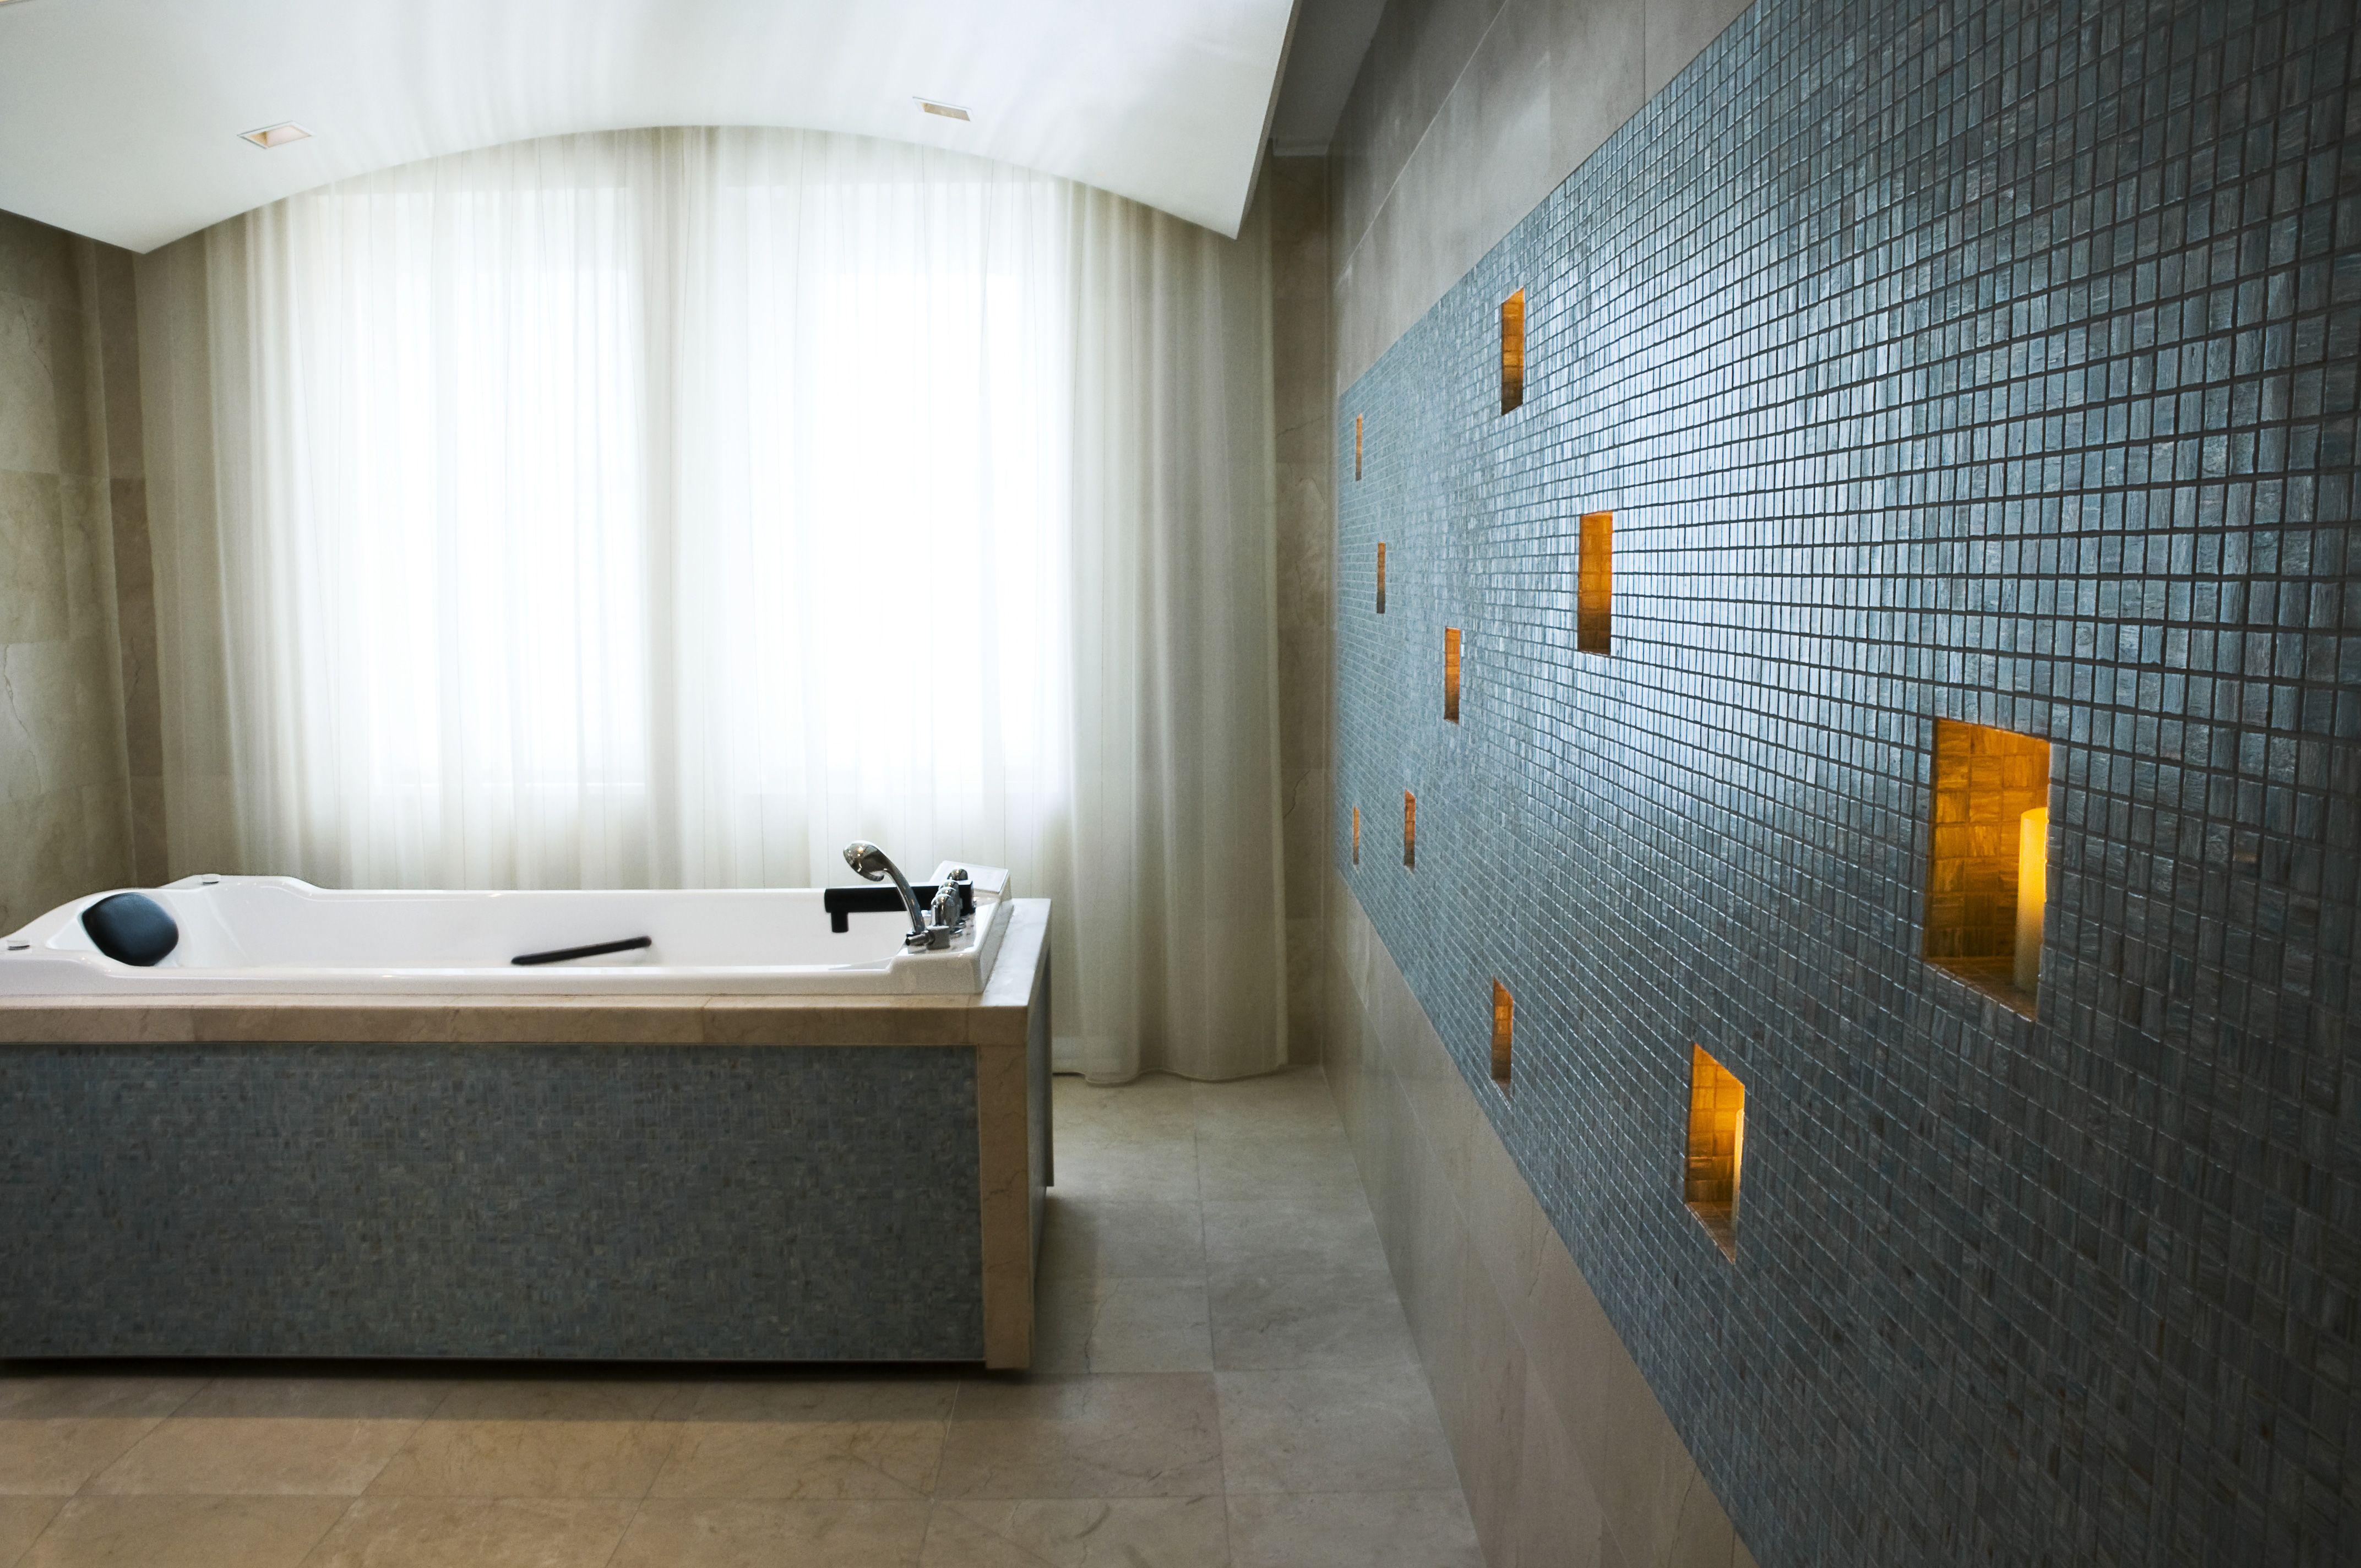 Beautiful Tile Work Guerlain Spa At Waldorf Astoria Tile Pinterest